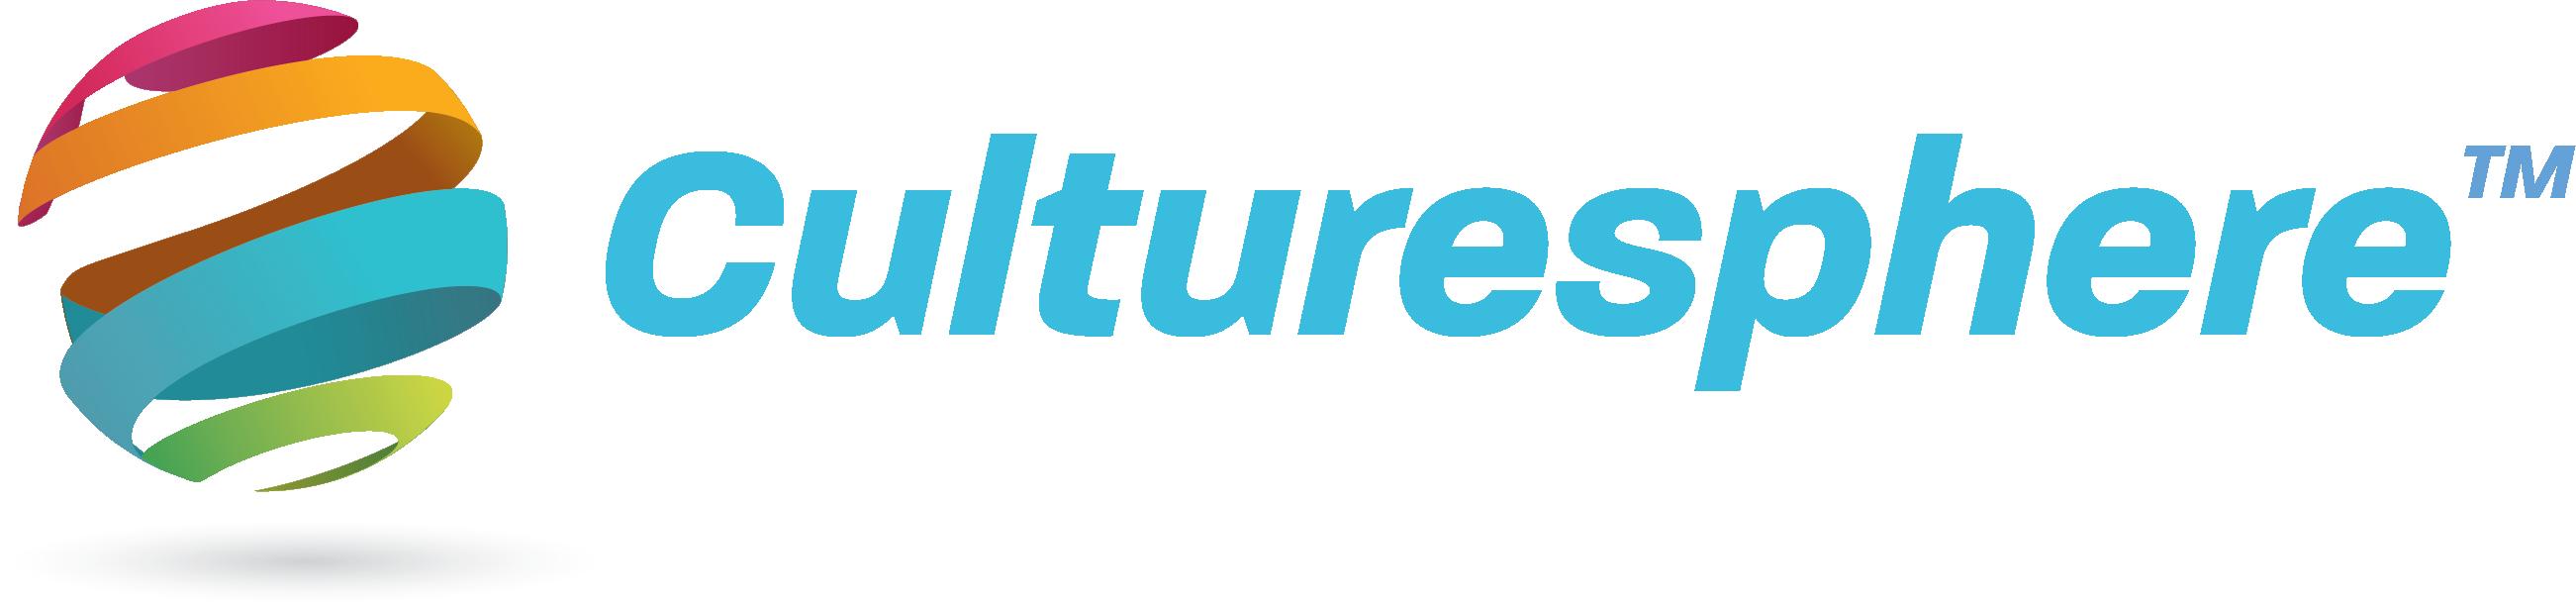 culturesphere-horizontal